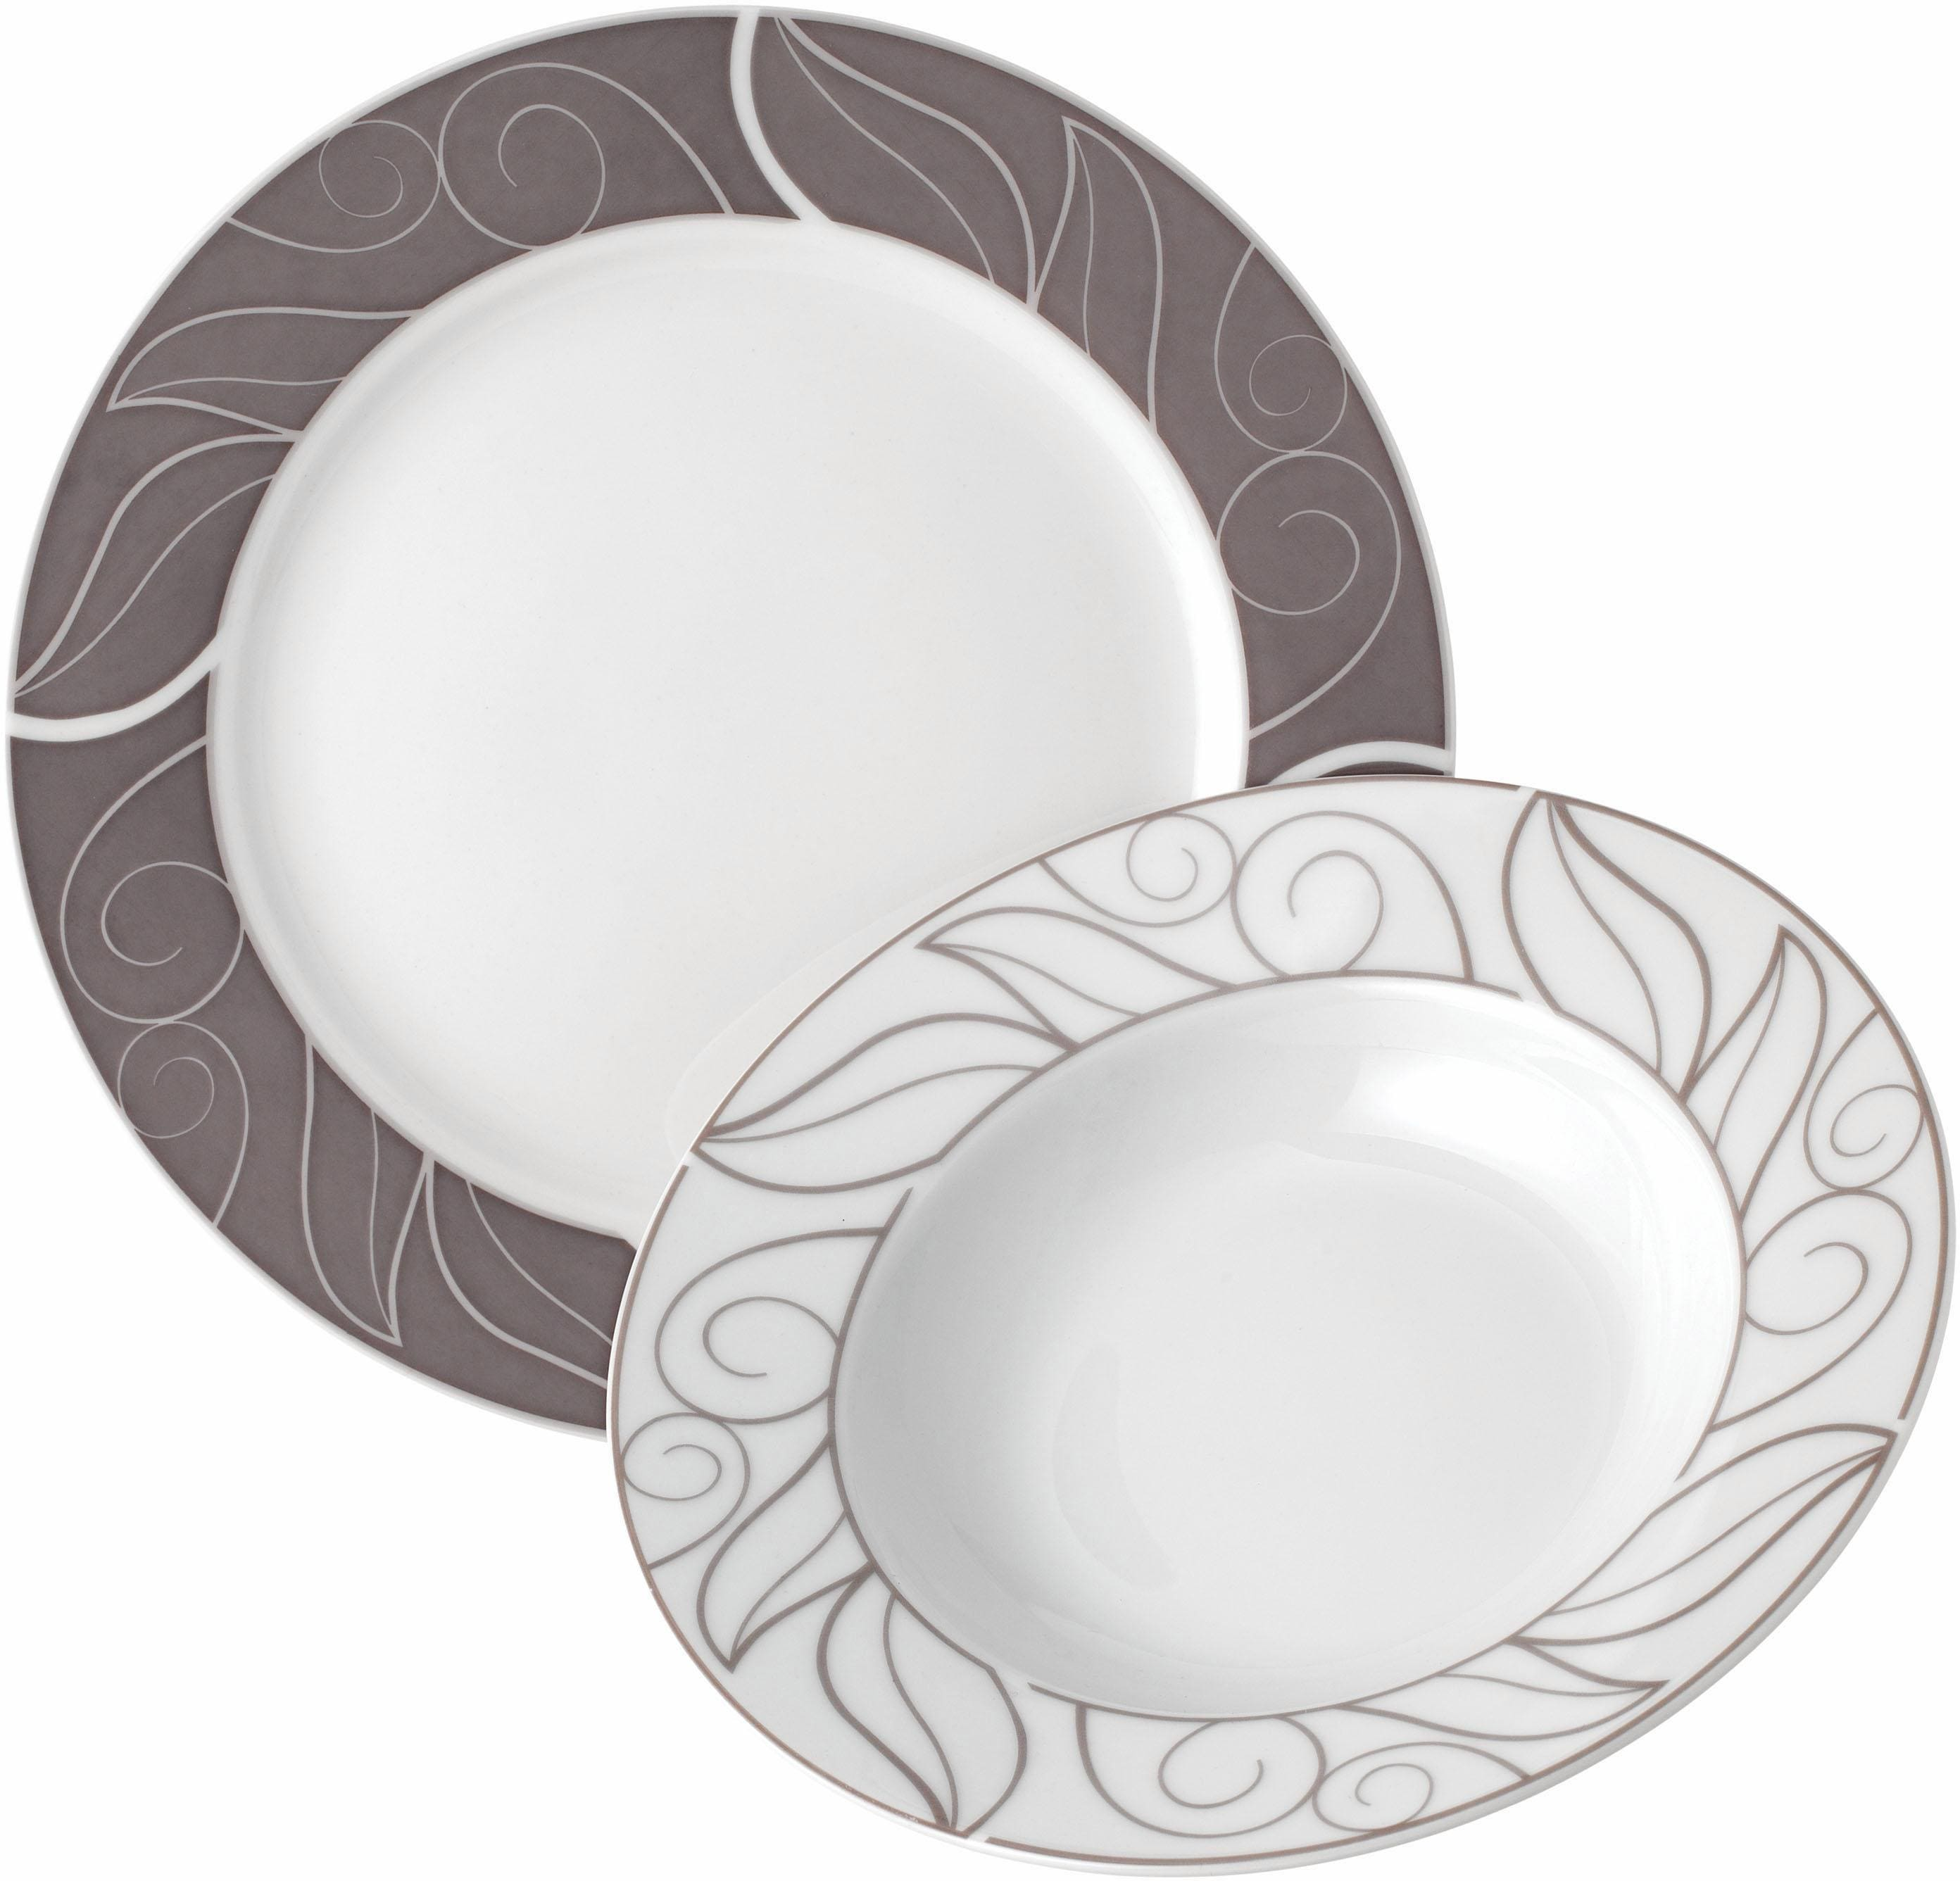 van Well Tafelservice GRENOBLE, (Set, 12 tlg.), Spülmaschinengeeignet weiß Geschirr-Sets Geschirr, Porzellan Tischaccessoires Haushaltswaren